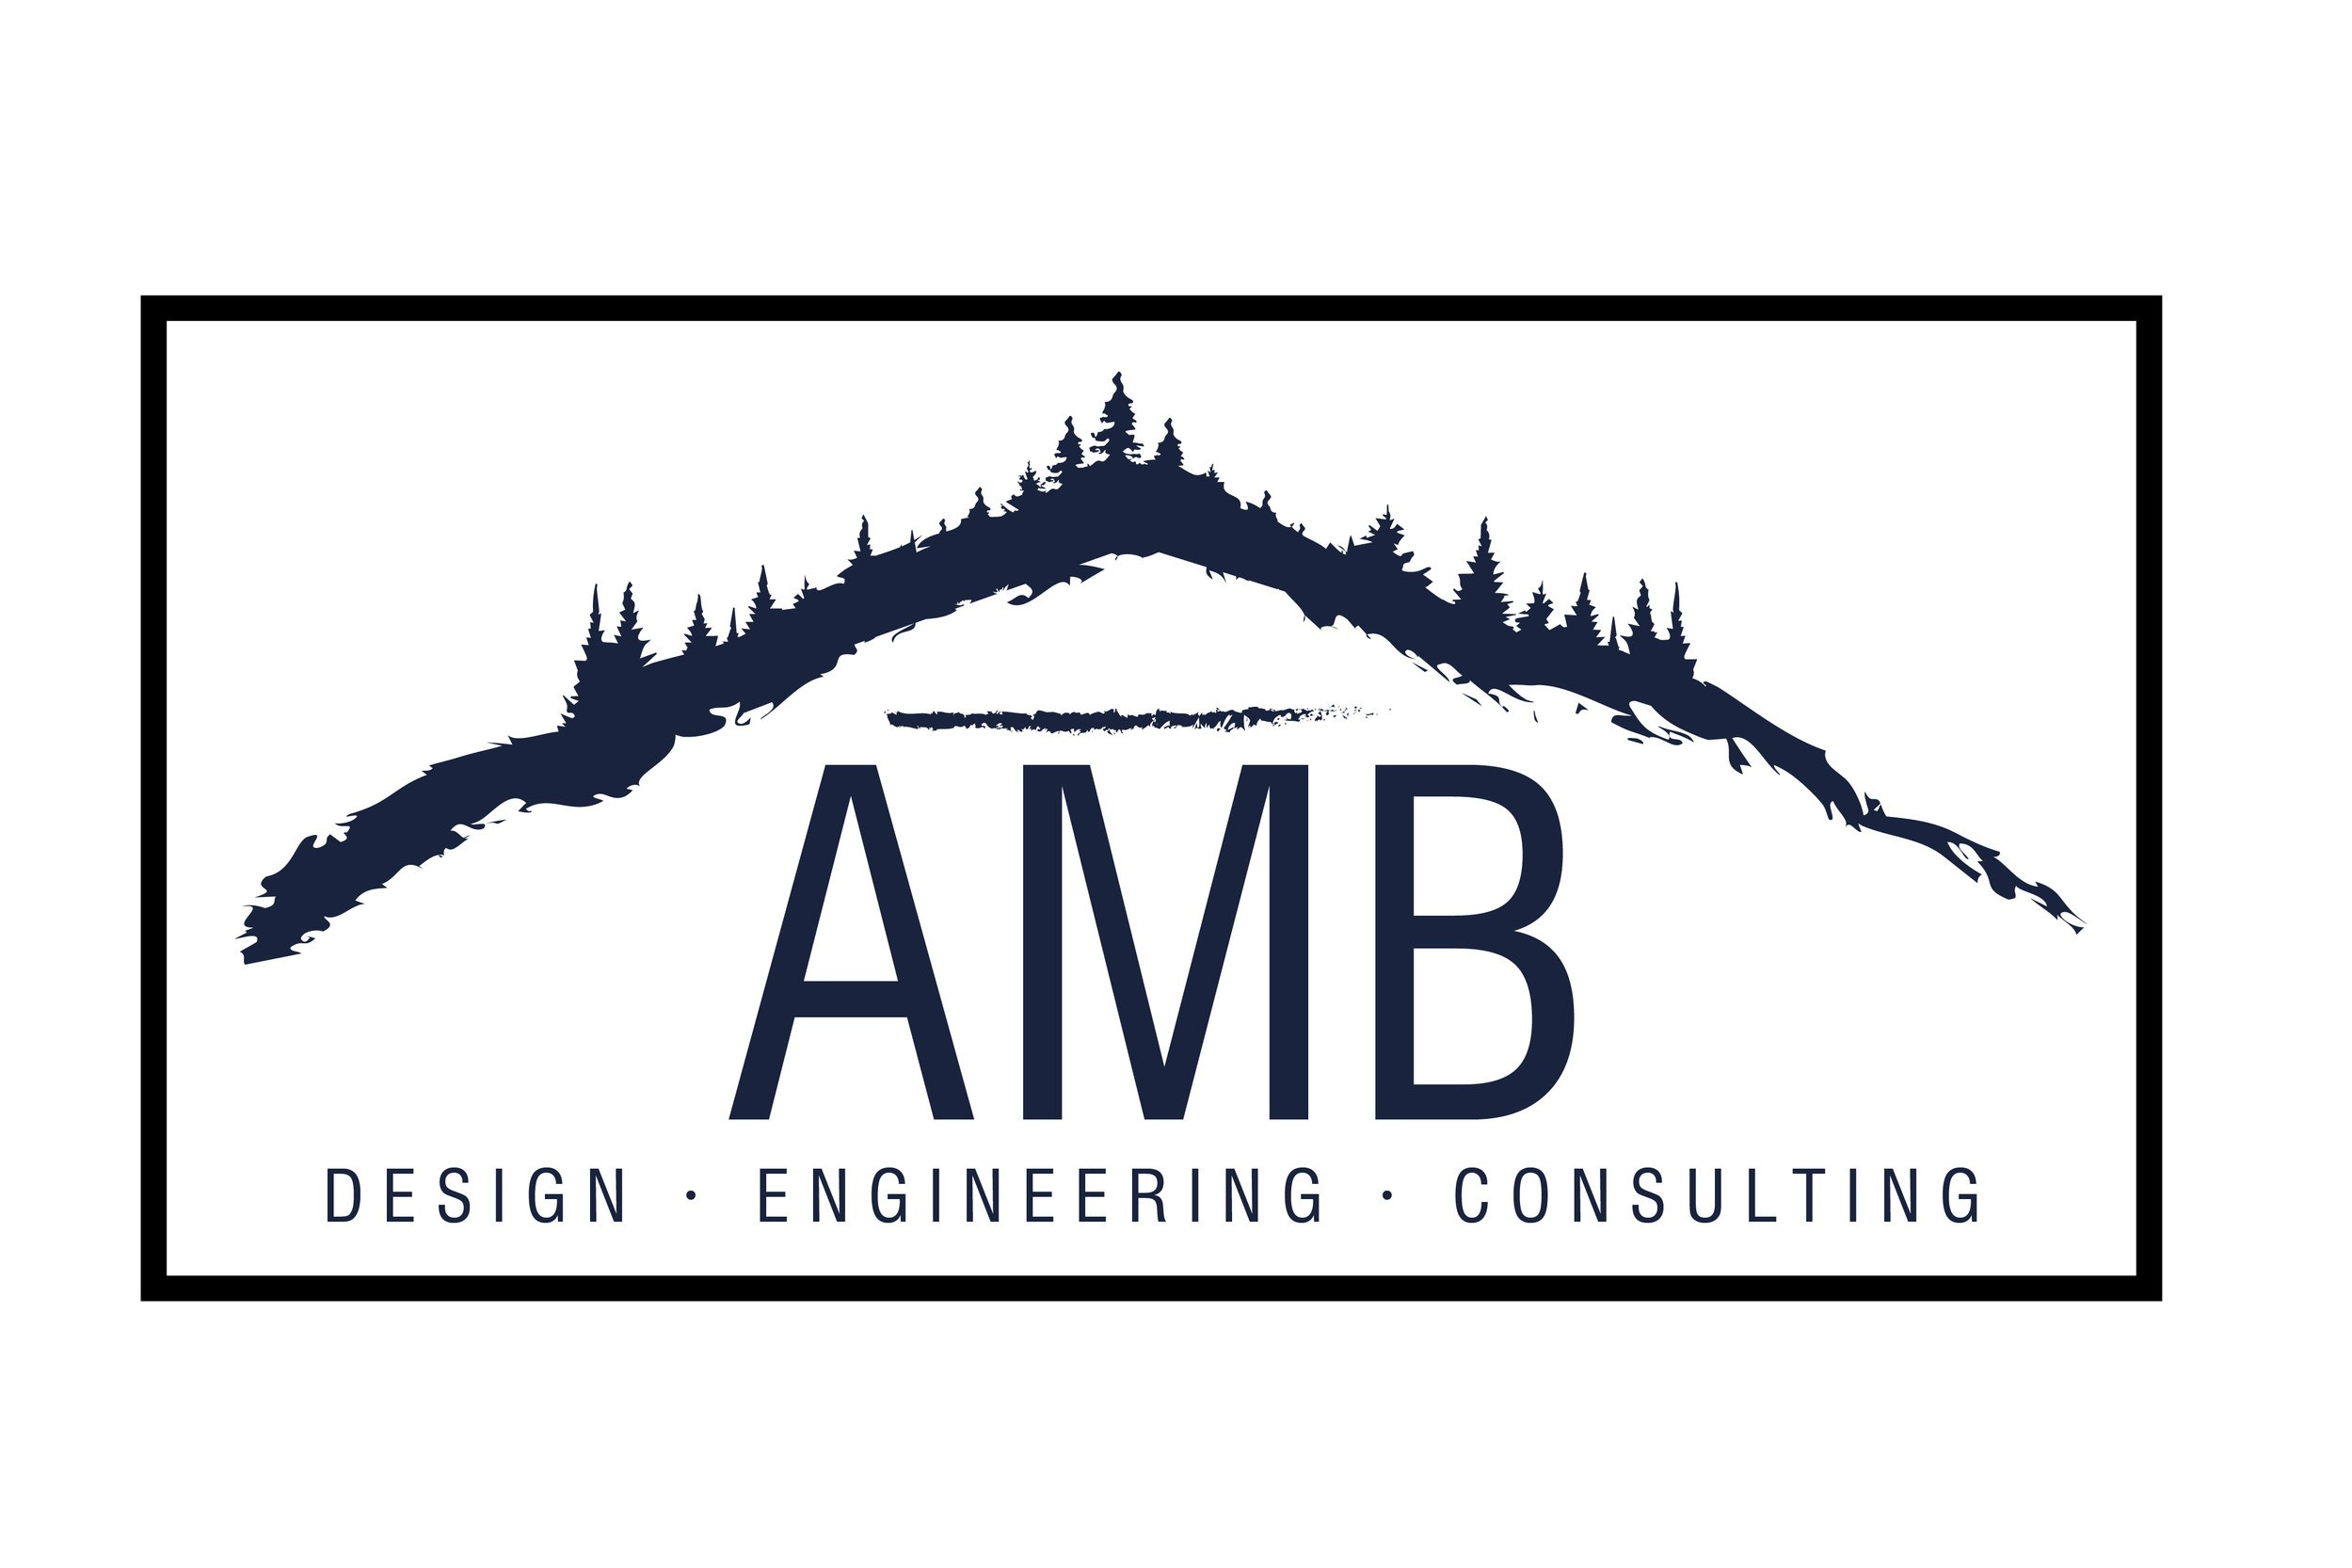 AMB-Logo-282C-CONSULTING-editable.jpg